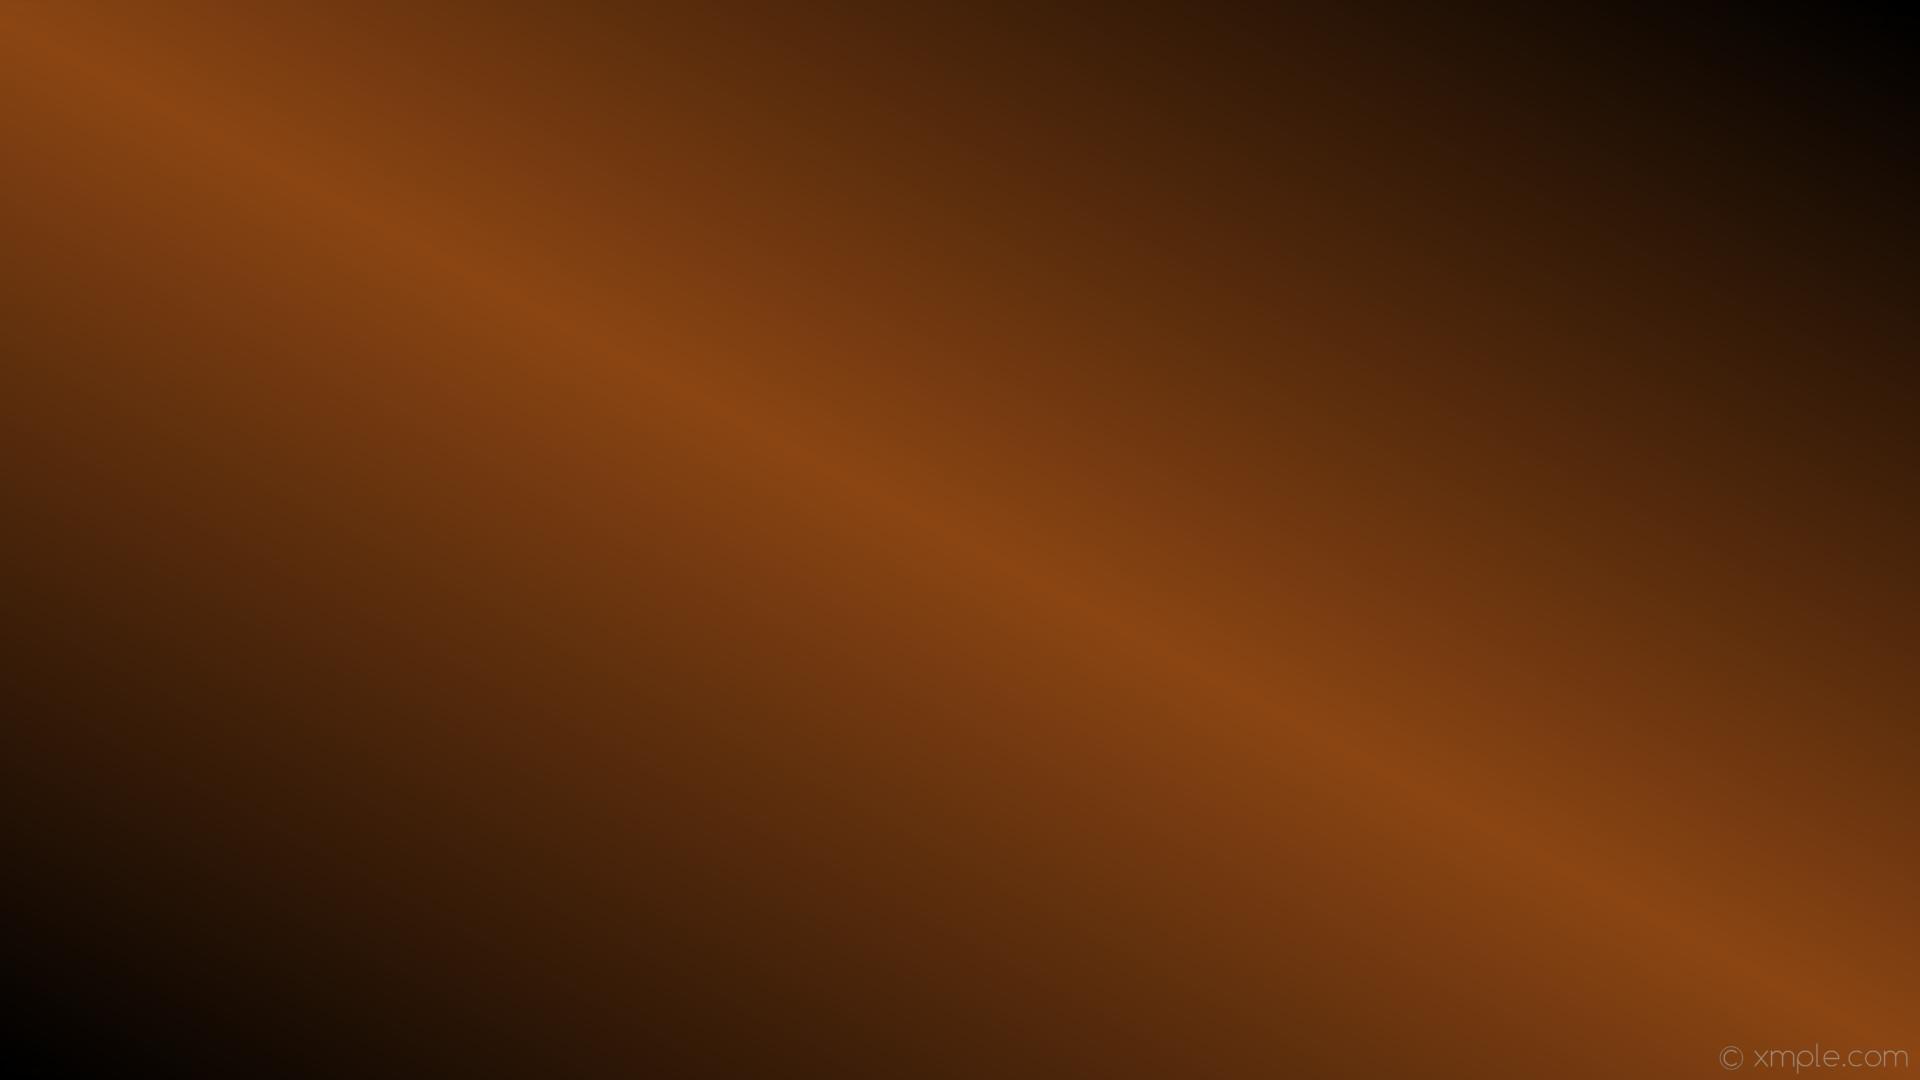 wallpaper brown highlight black gradient linear saddle brown #000000  #8b4513 30° 50%